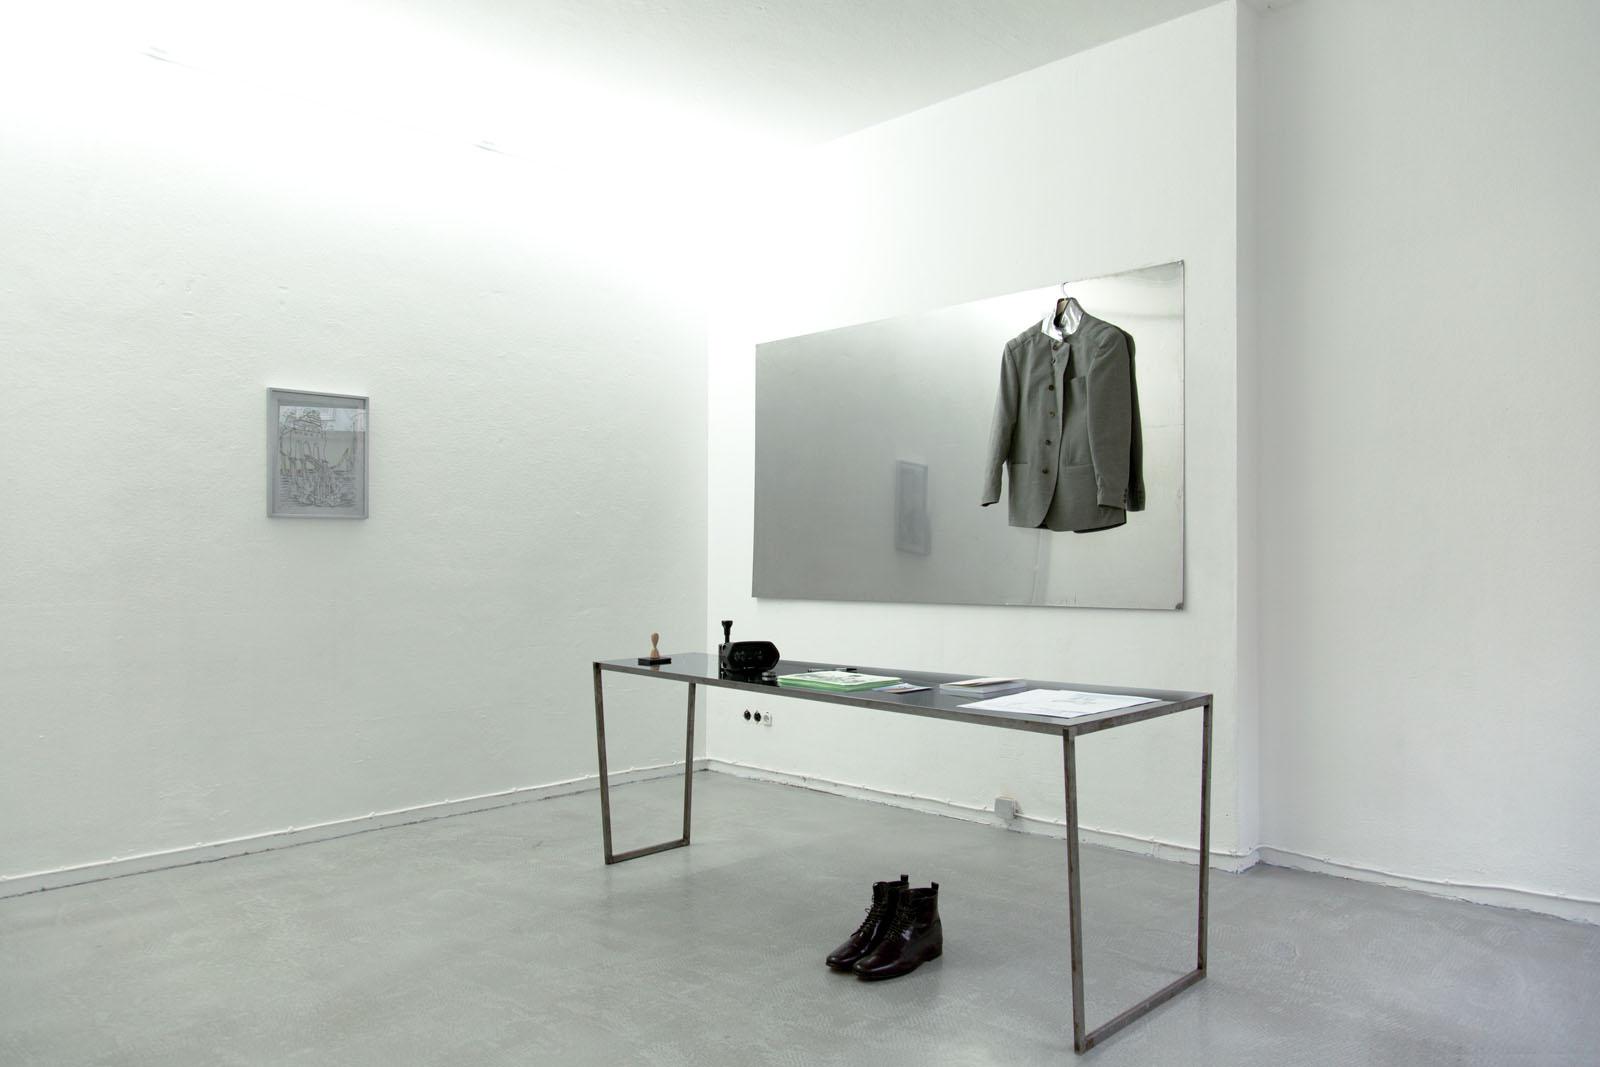 nikoabramidis_hybris_illusion_fotojakobwiessner